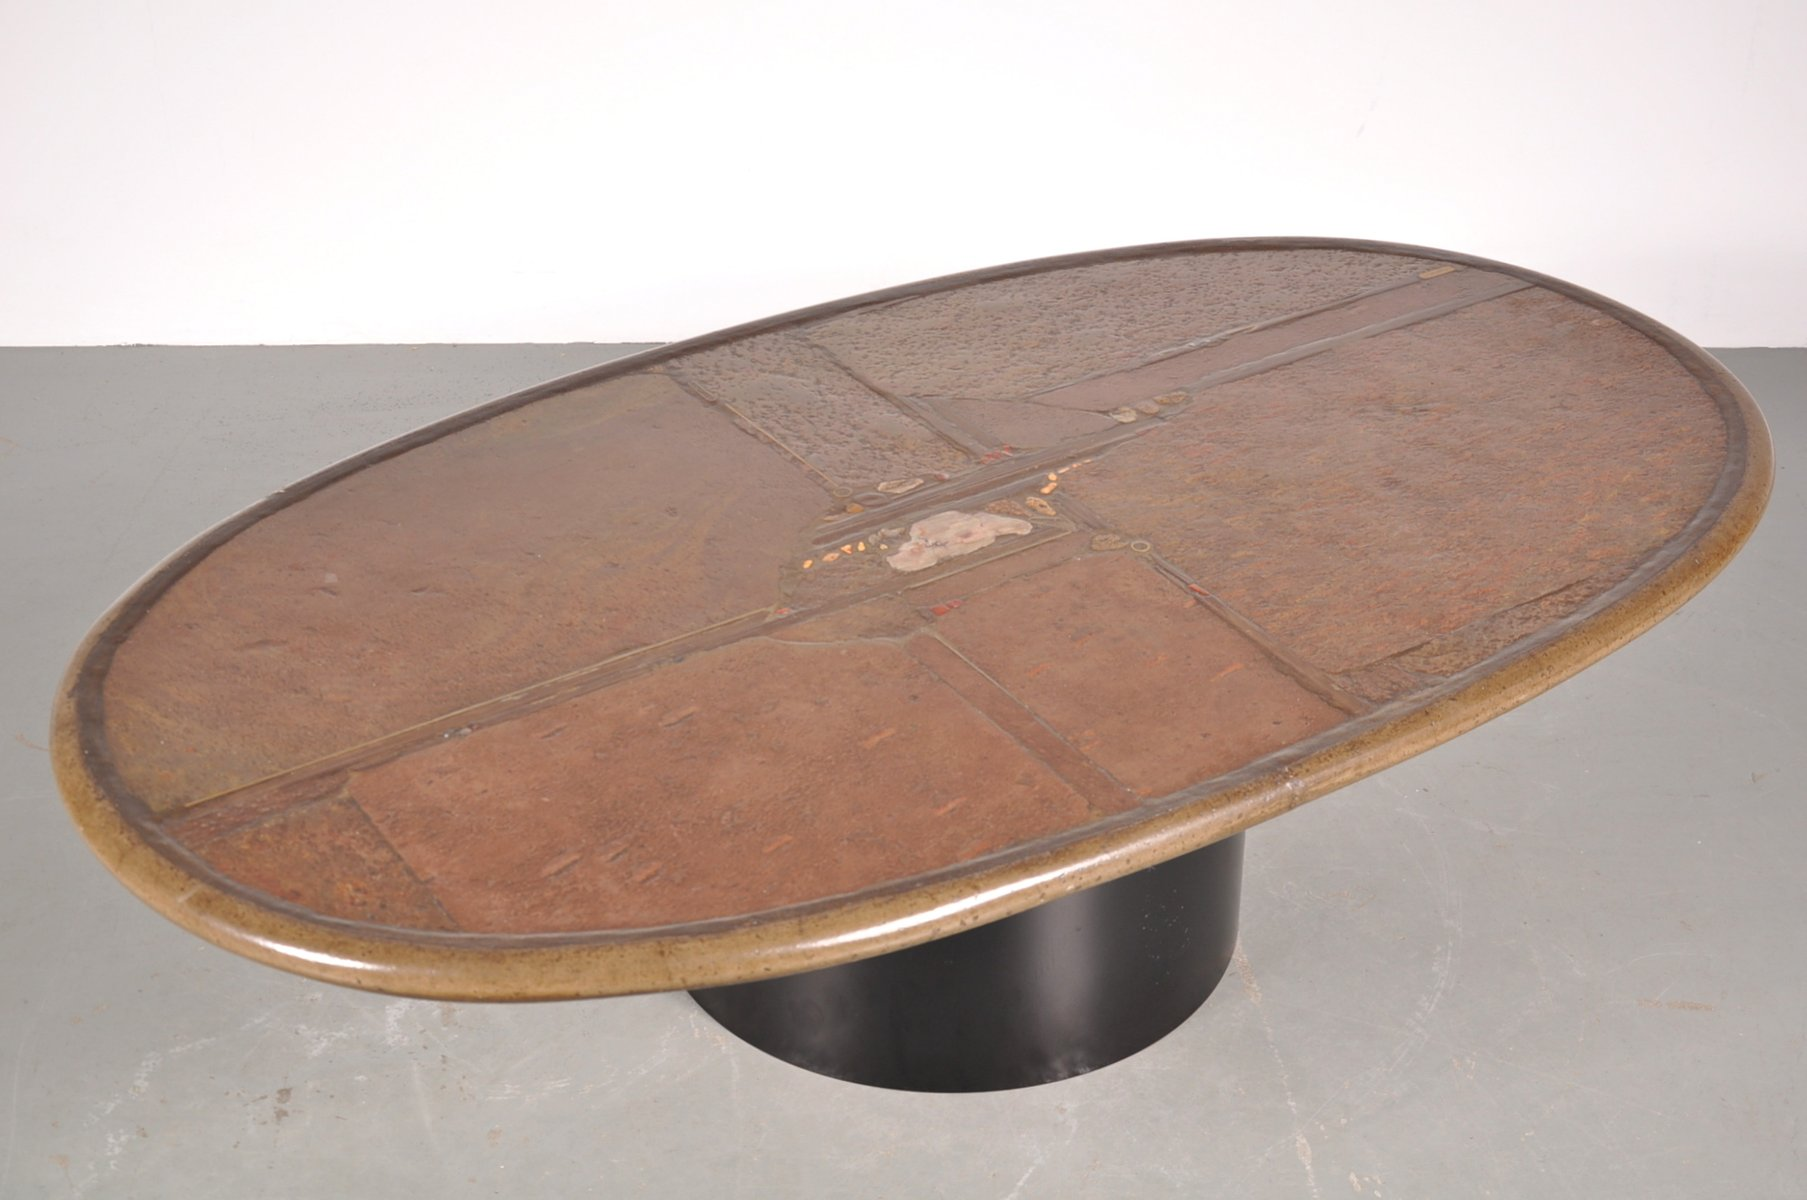 vintage stone coffee tablepaul kingma, 1993 for sale at pamono